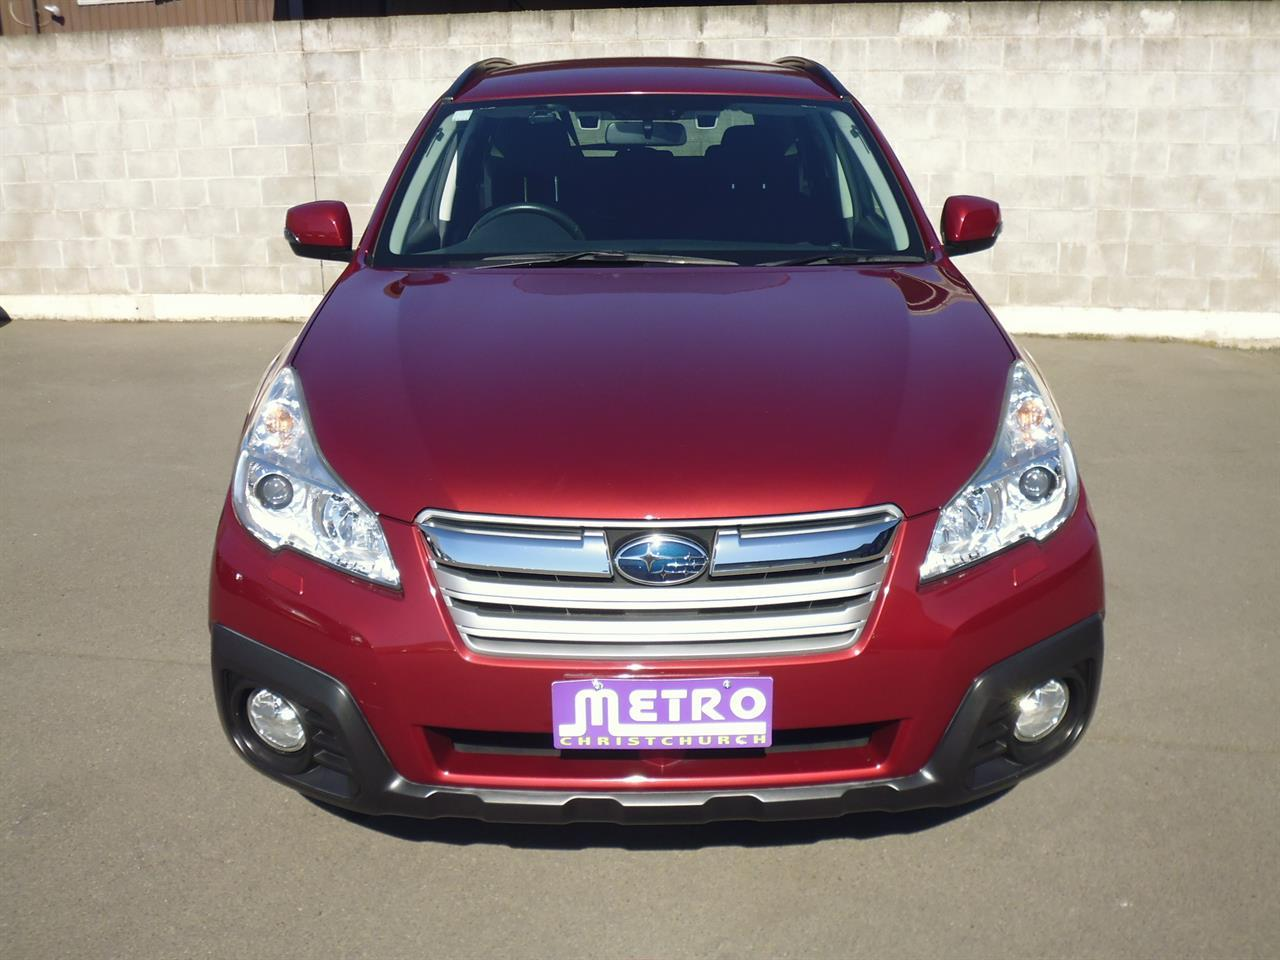 image-9, 2012 Subaru Outback 2.5i Eyesight at Christchurch